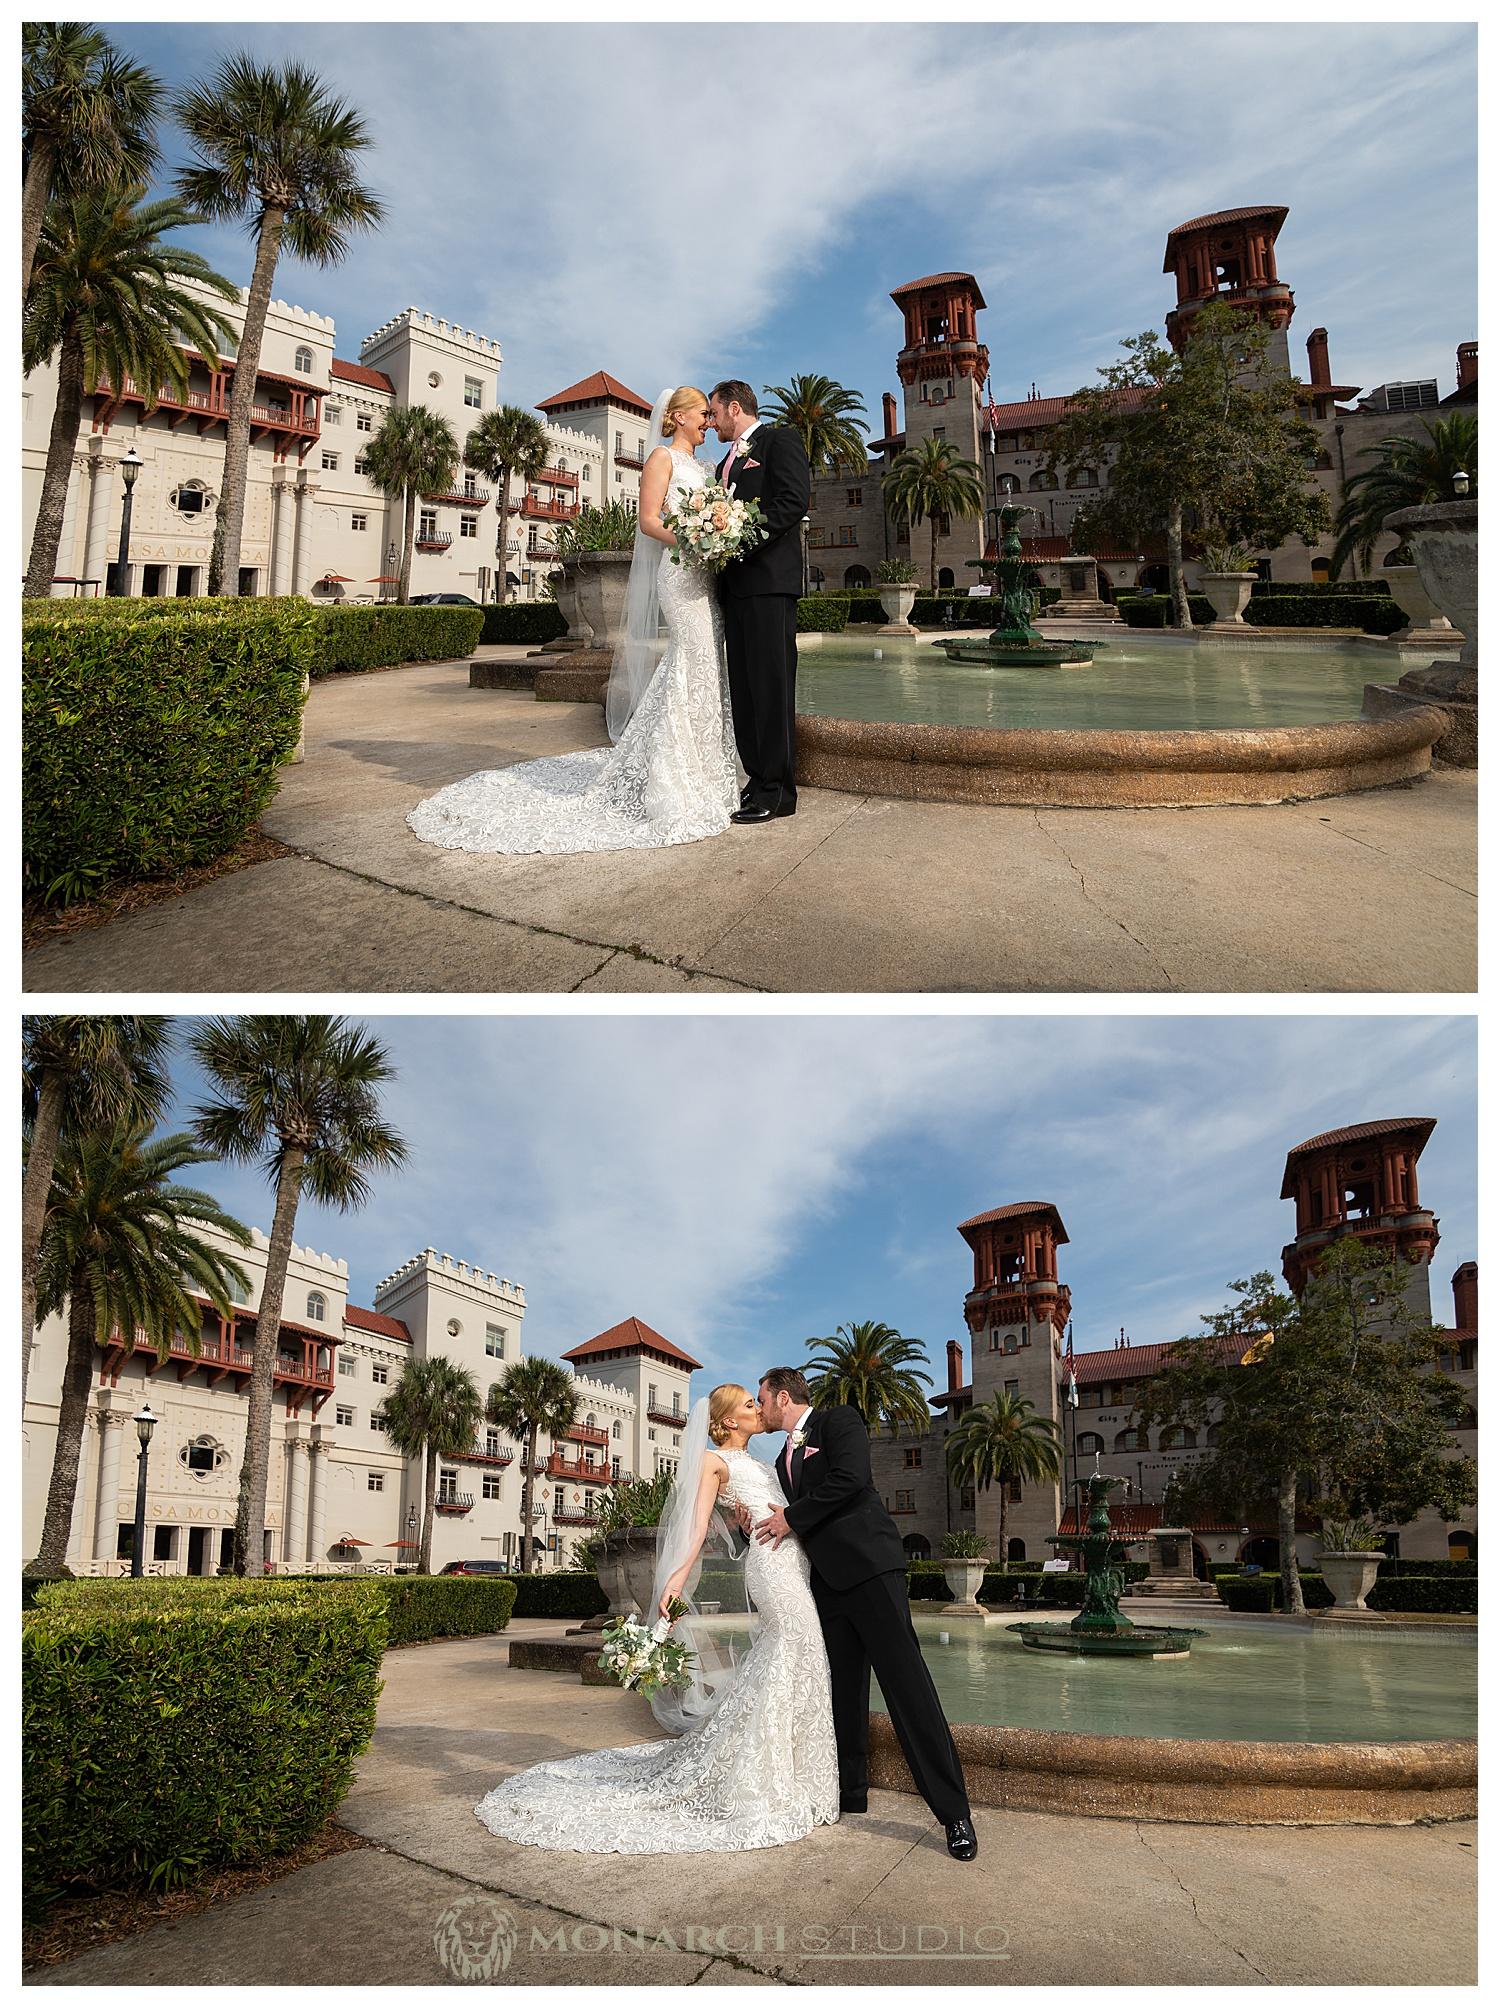 St. Augustine Wedding - Amore Wedding Chapel - 046.JPG